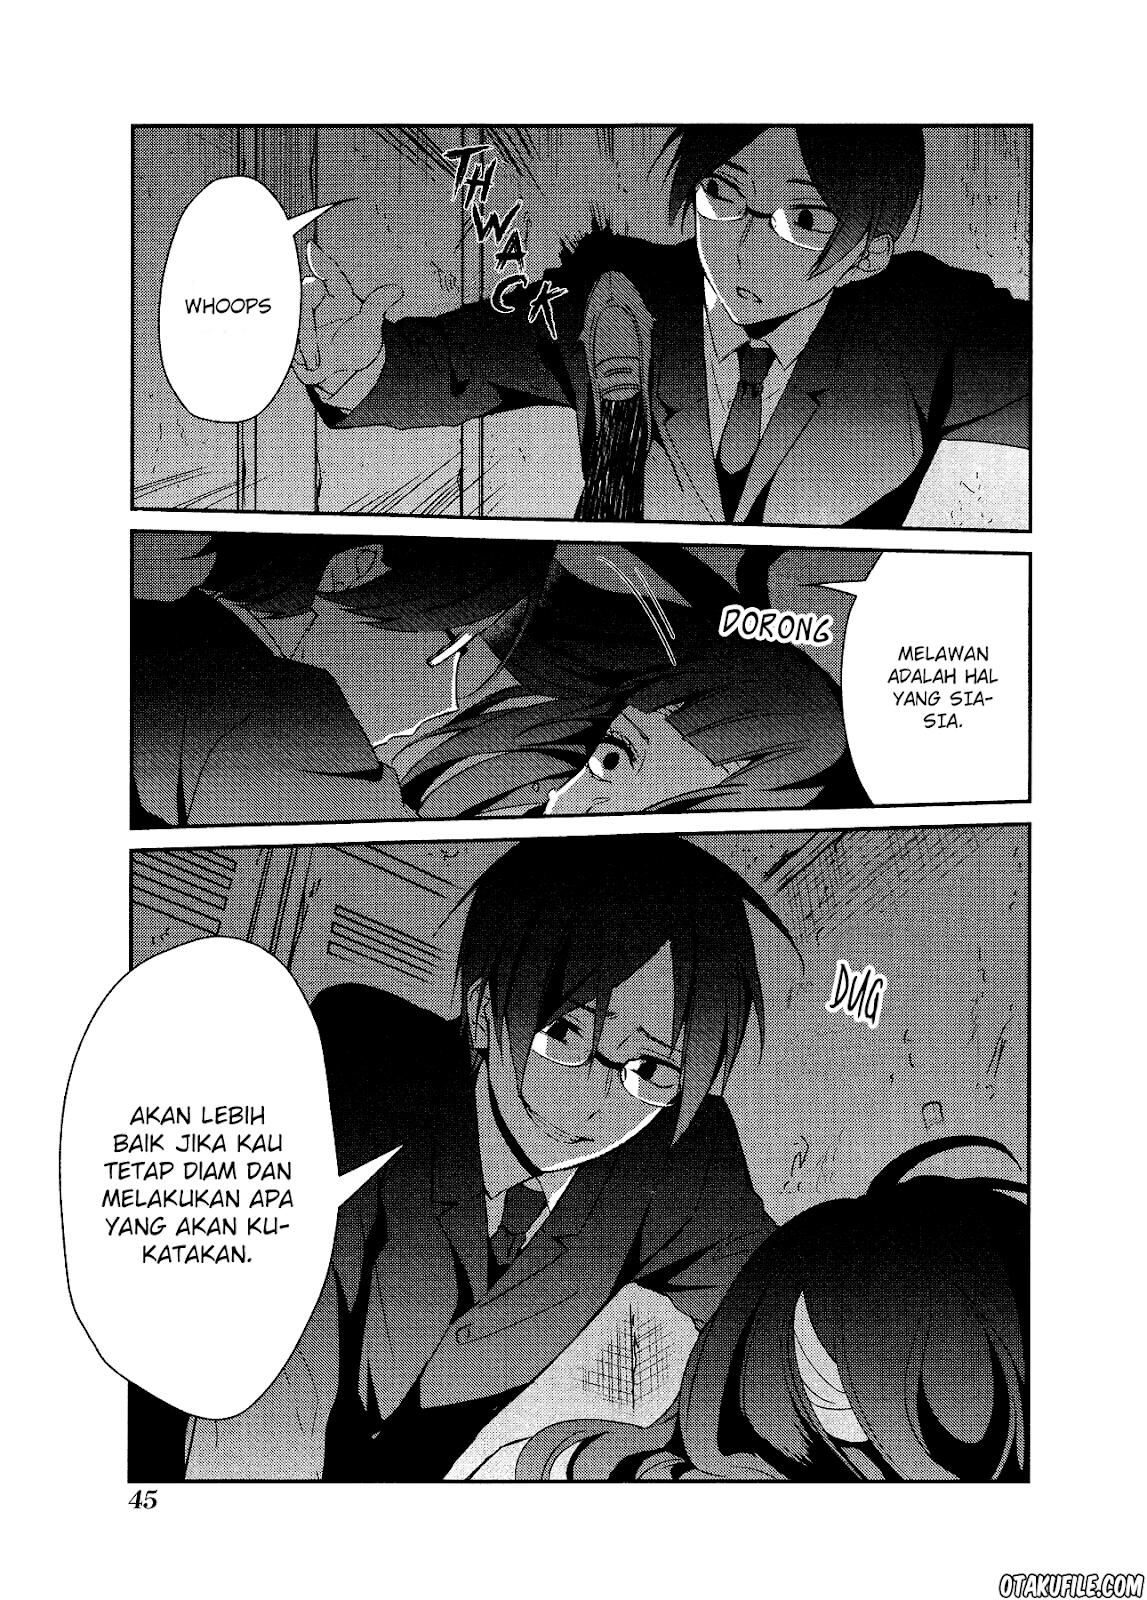 Komik sachi iro no one room 014 - chapter 14 15 Indonesia sachi iro no one room 014 - chapter 14 Terbaru 11|Baca Manga Komik Indonesia